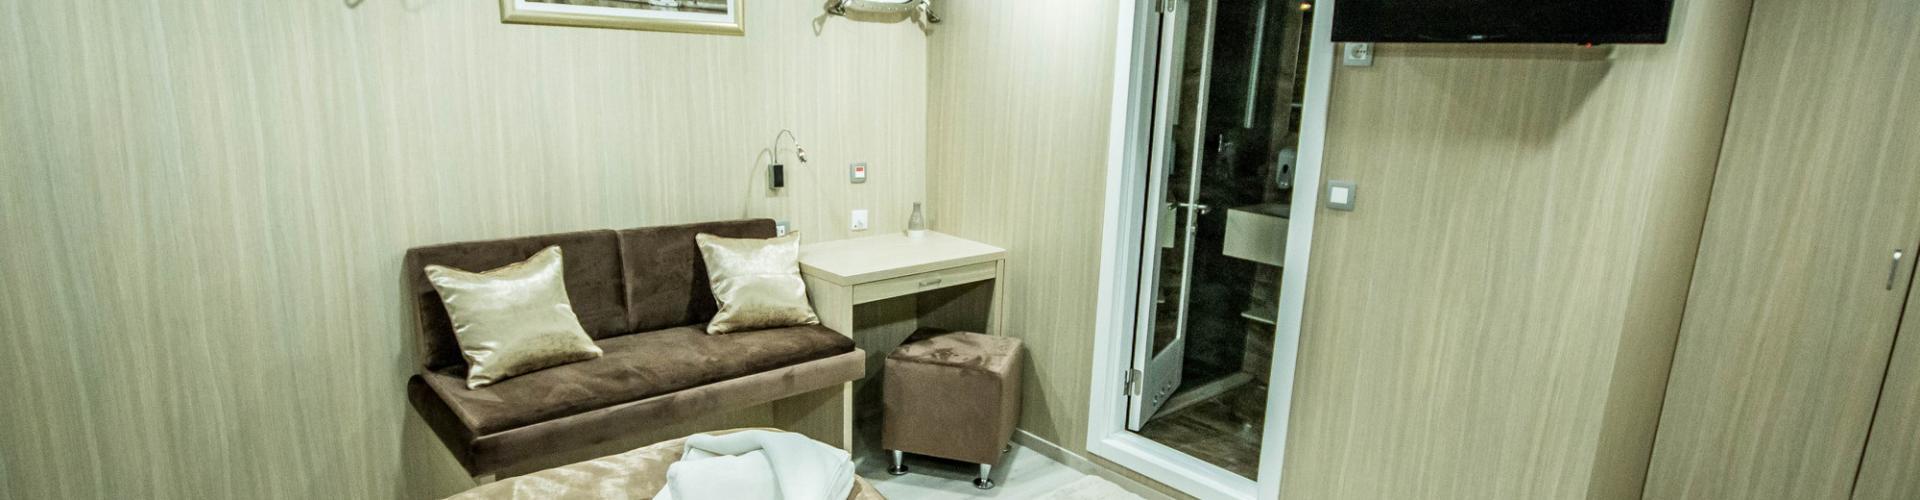 cabin on cruising Cabin (lower deck)